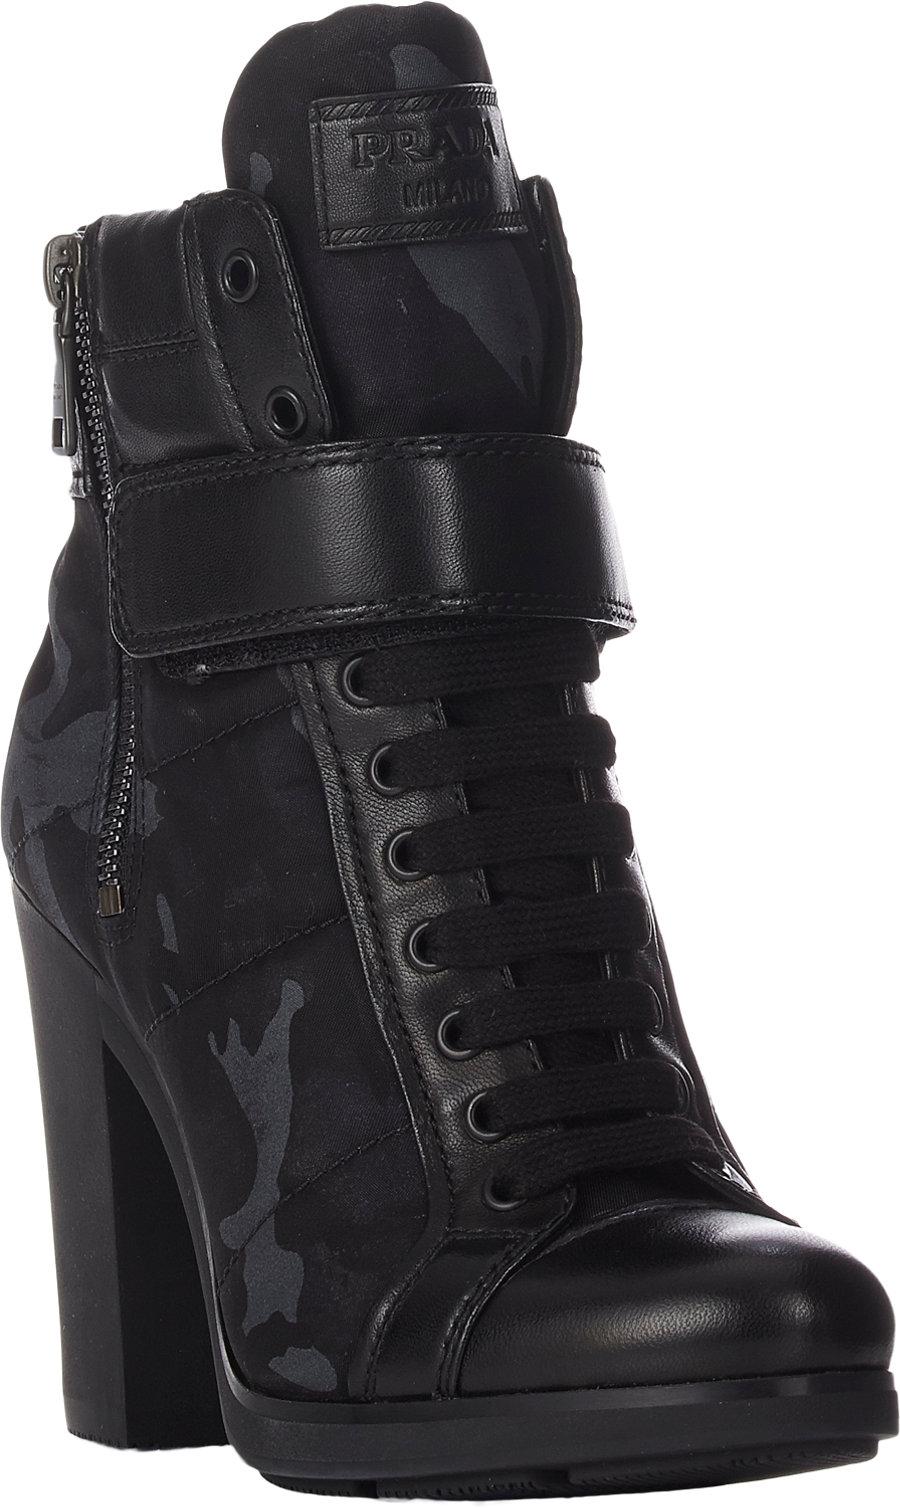 Prada linea rossa Camo-Print Double-Zip Boots in Blue | Lyst